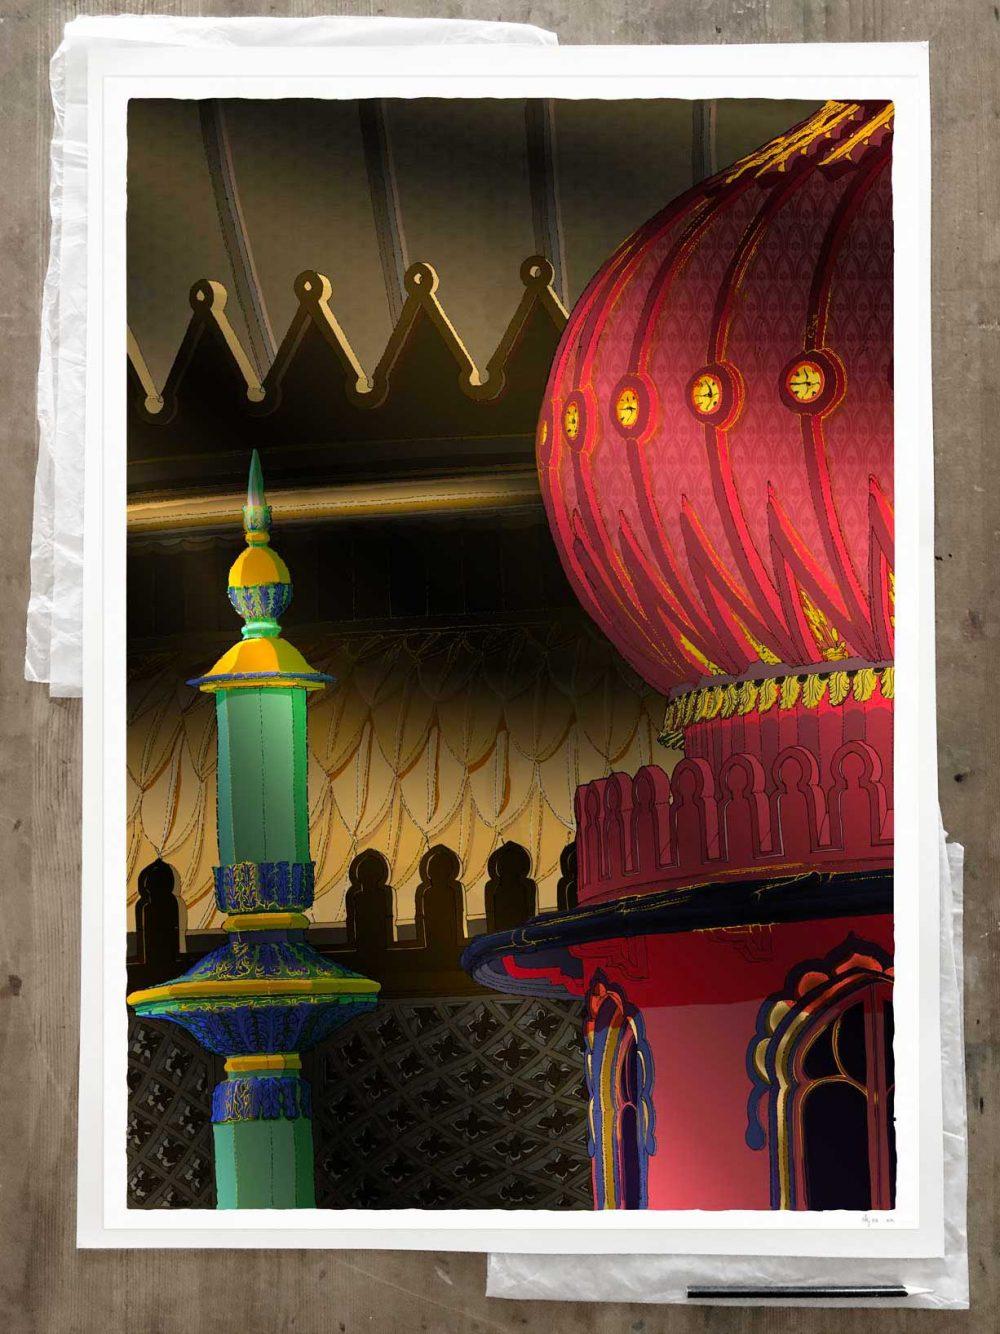 Fine art print by artist alej ez titled Brighton Pavilion Finial and Domes Regency Nights